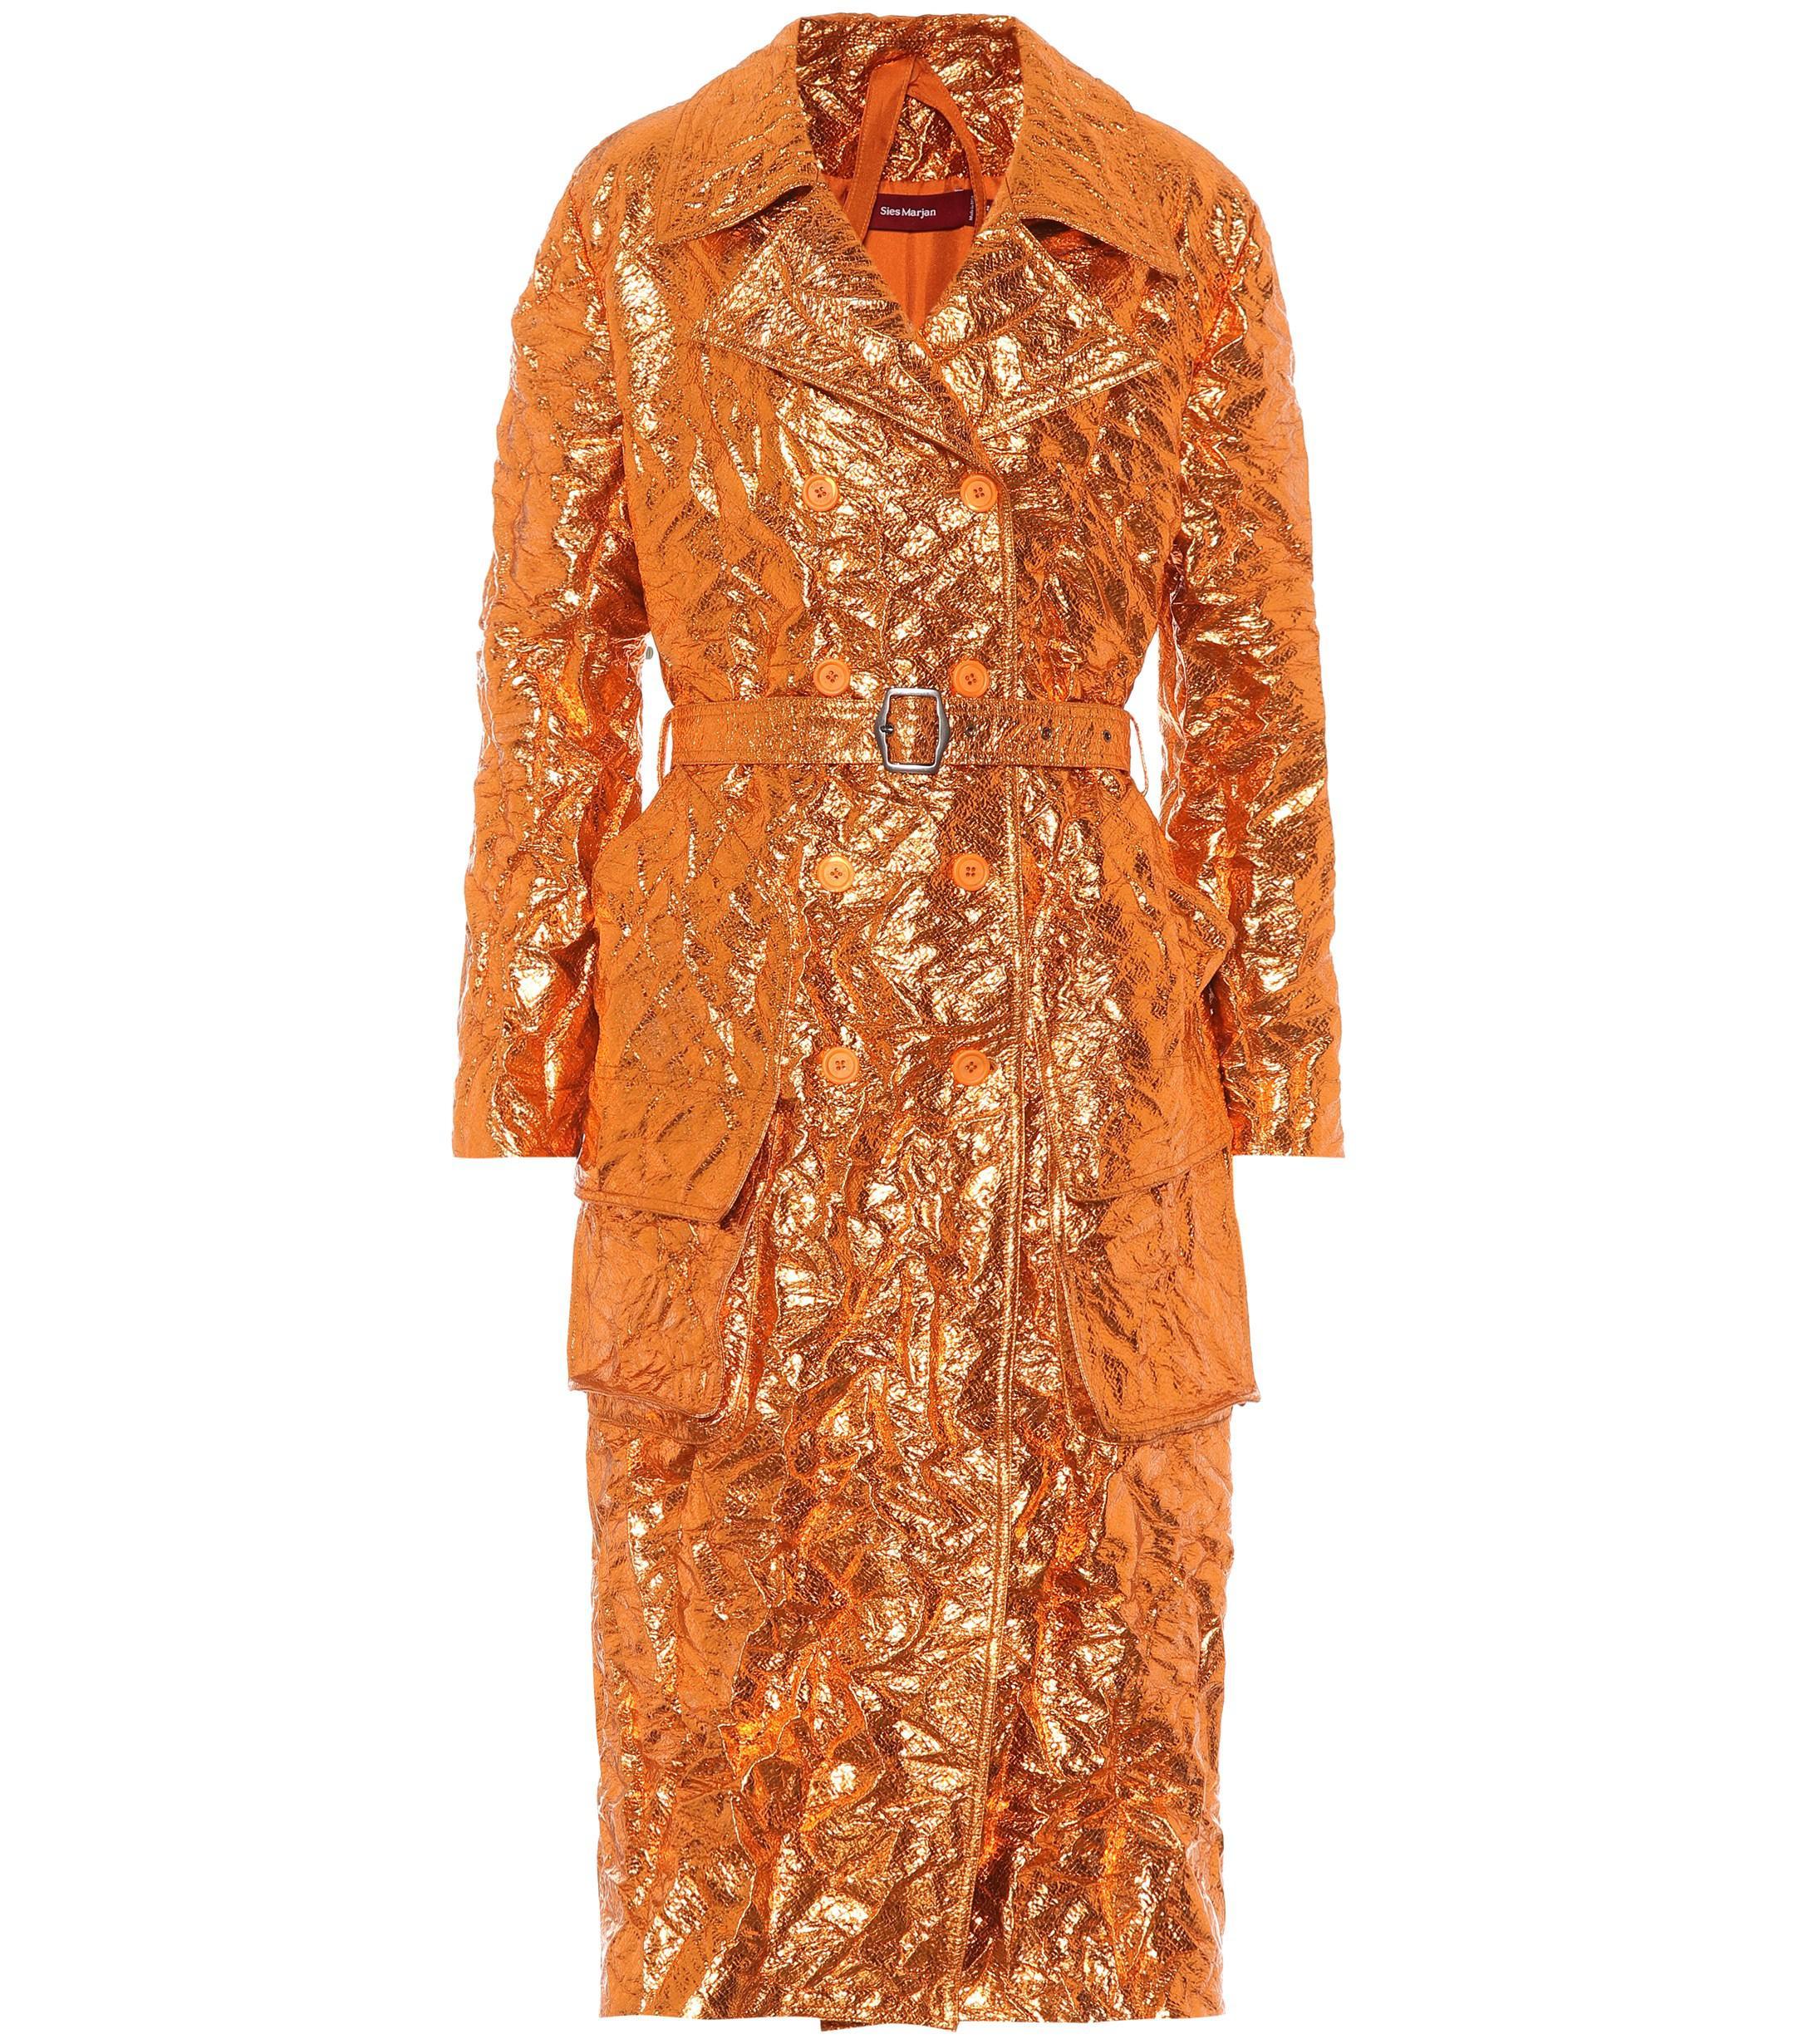 Marjan Bessie Sies Trench View Lyst Orange Fullscreen Coat CqvBdaT